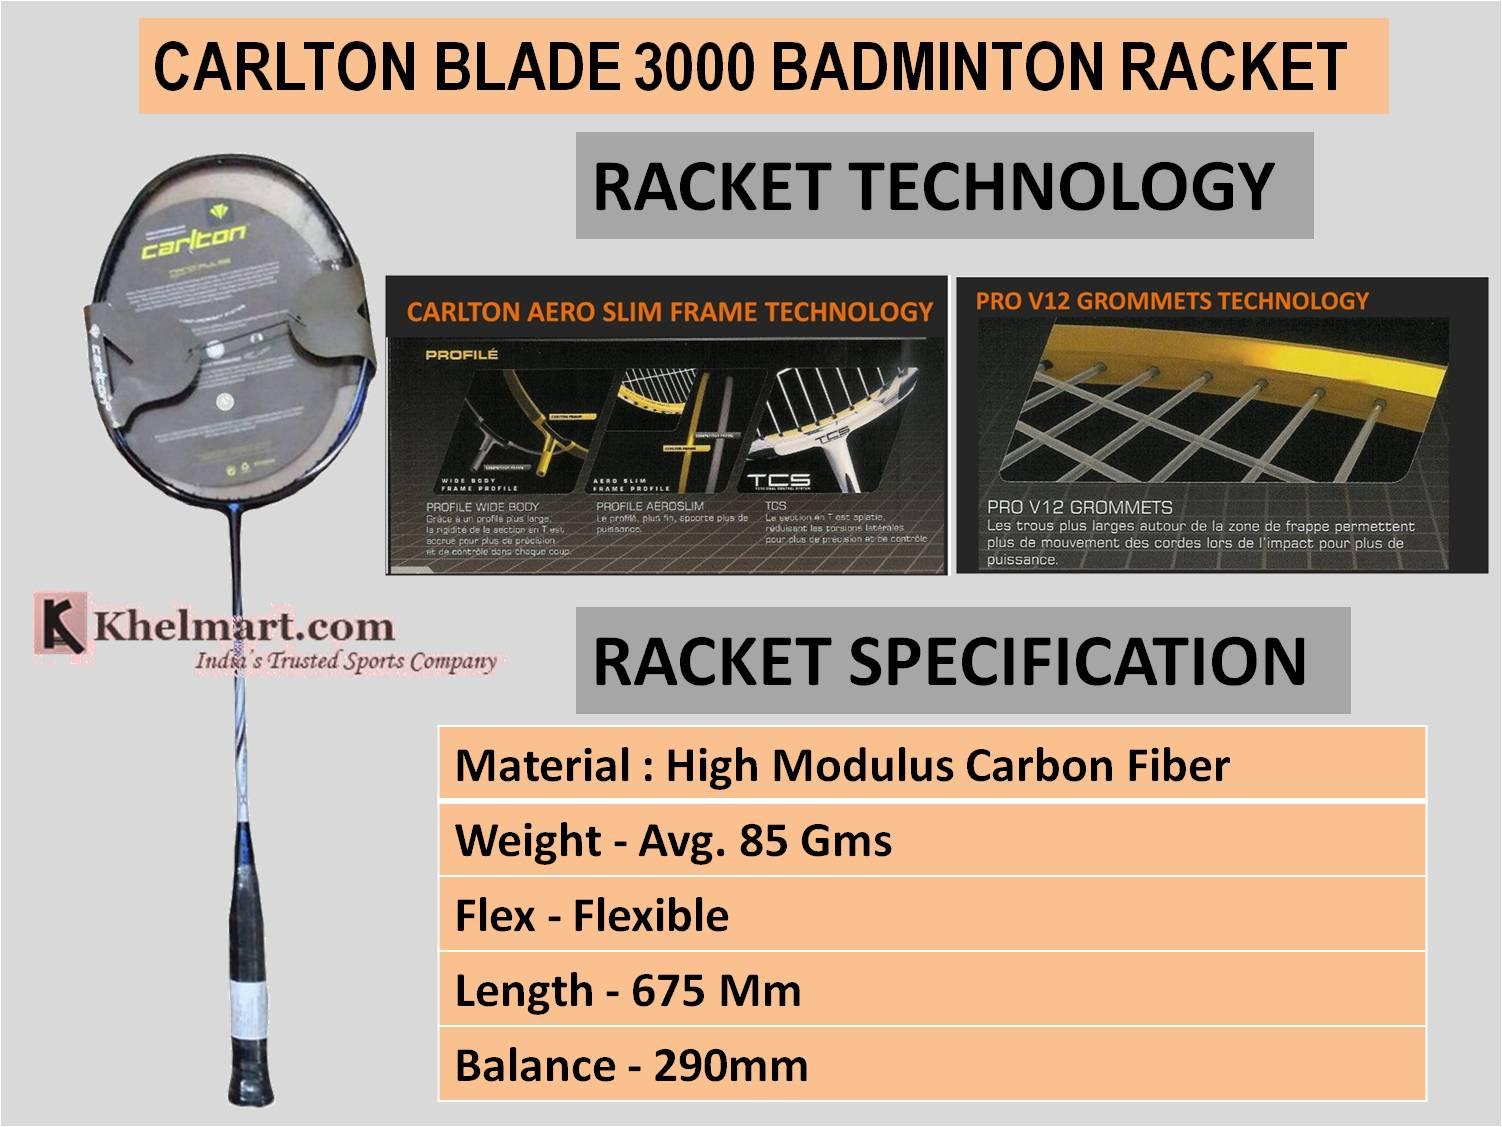 CARLTON_BLADE_3000_BADMINTON_RACKET